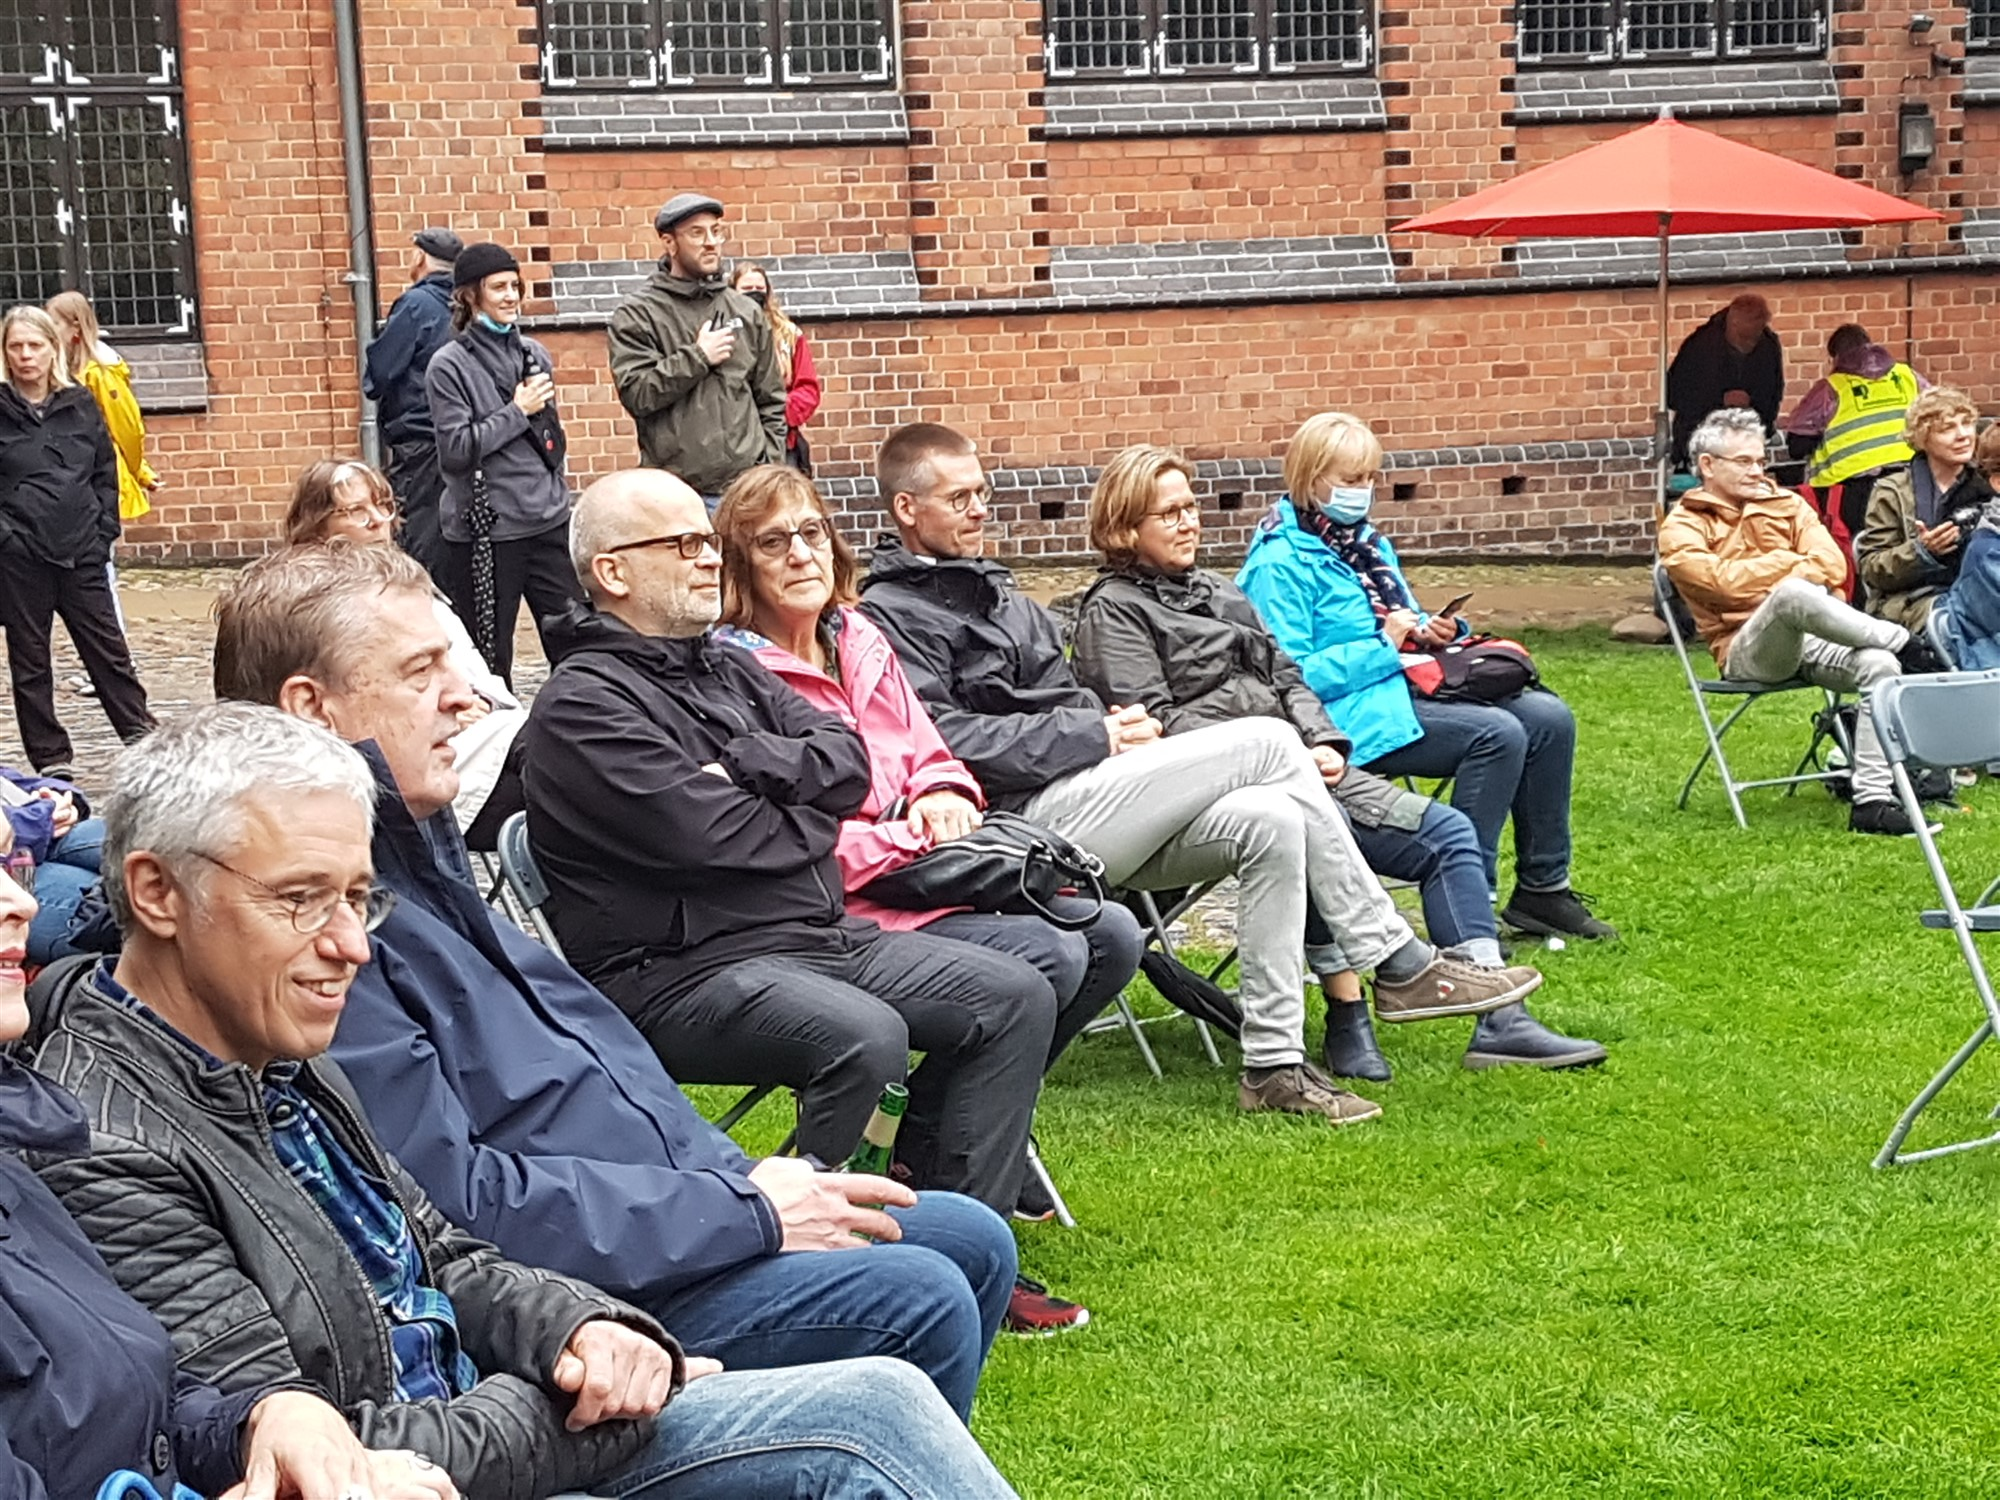 2021-08-28_Rathausgarten-Sommerfestival (16)